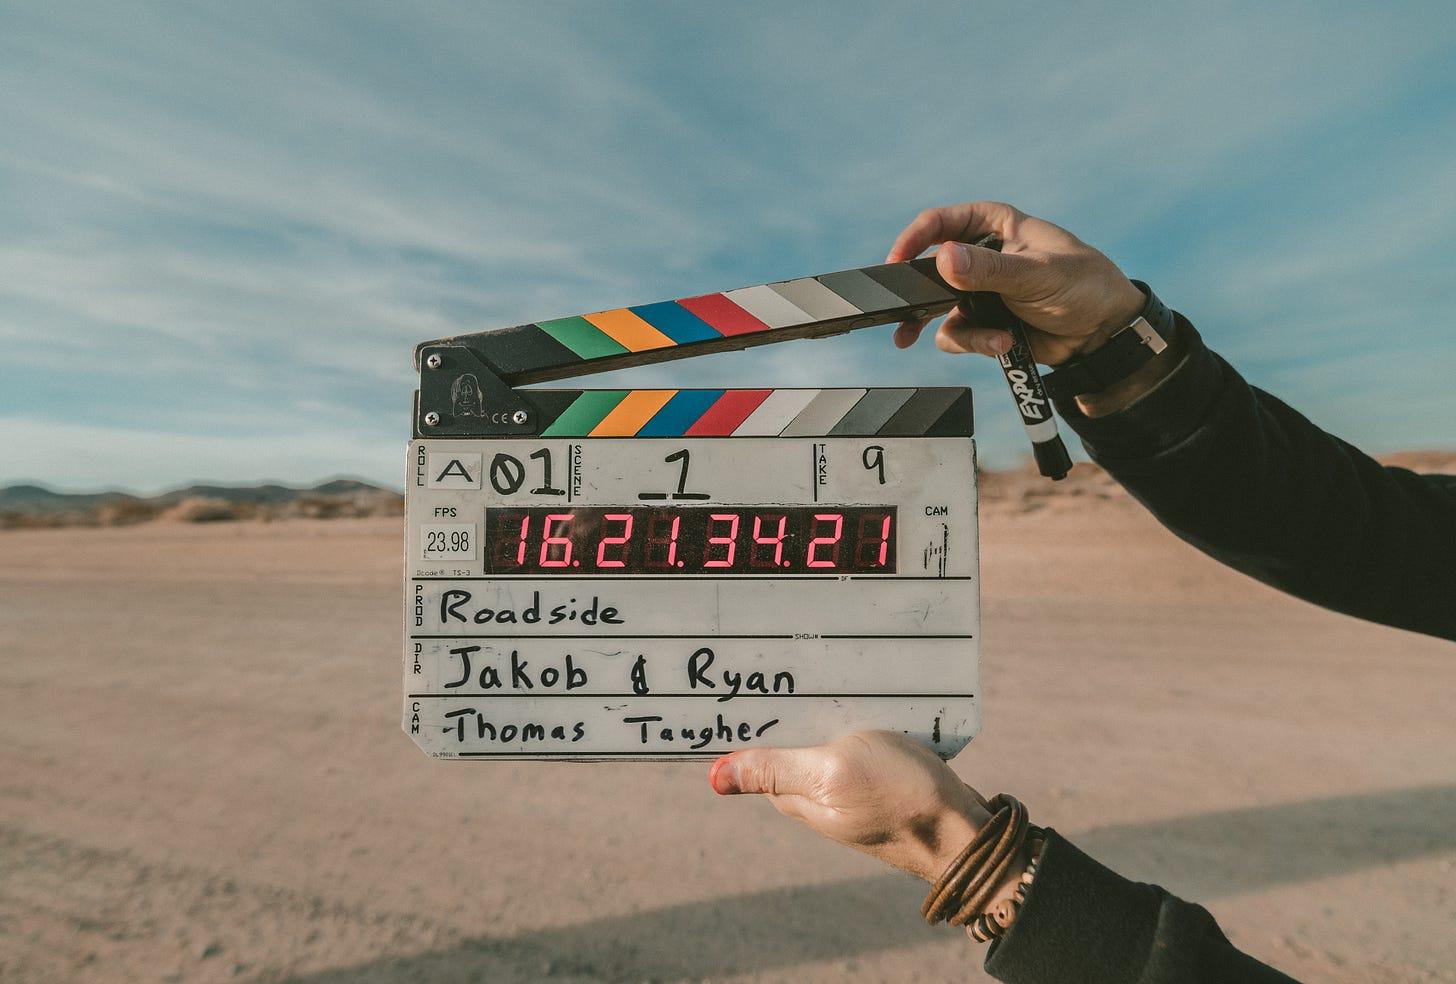 Movie production slate